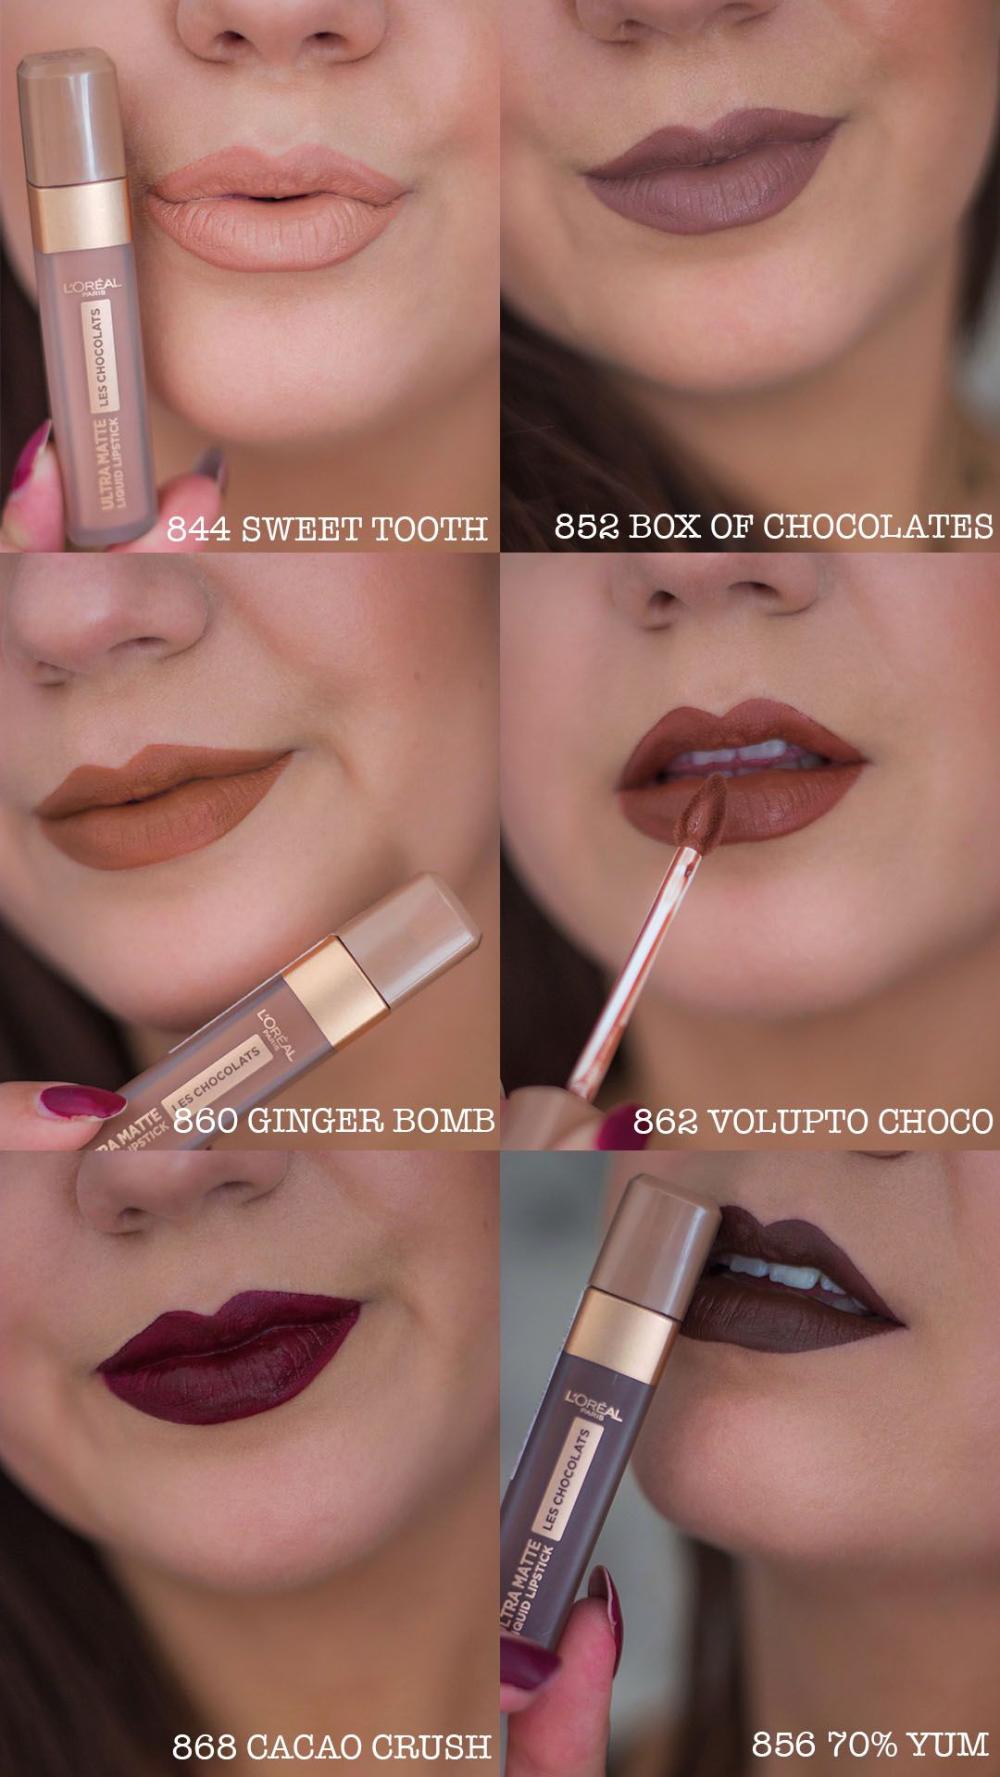 Les Chocolats Ultra Matte Liquid Lipstick 852 Box Of Chocolate Google Da Ara Rujlar Makyaj Gerecleri Dudak Renkleri